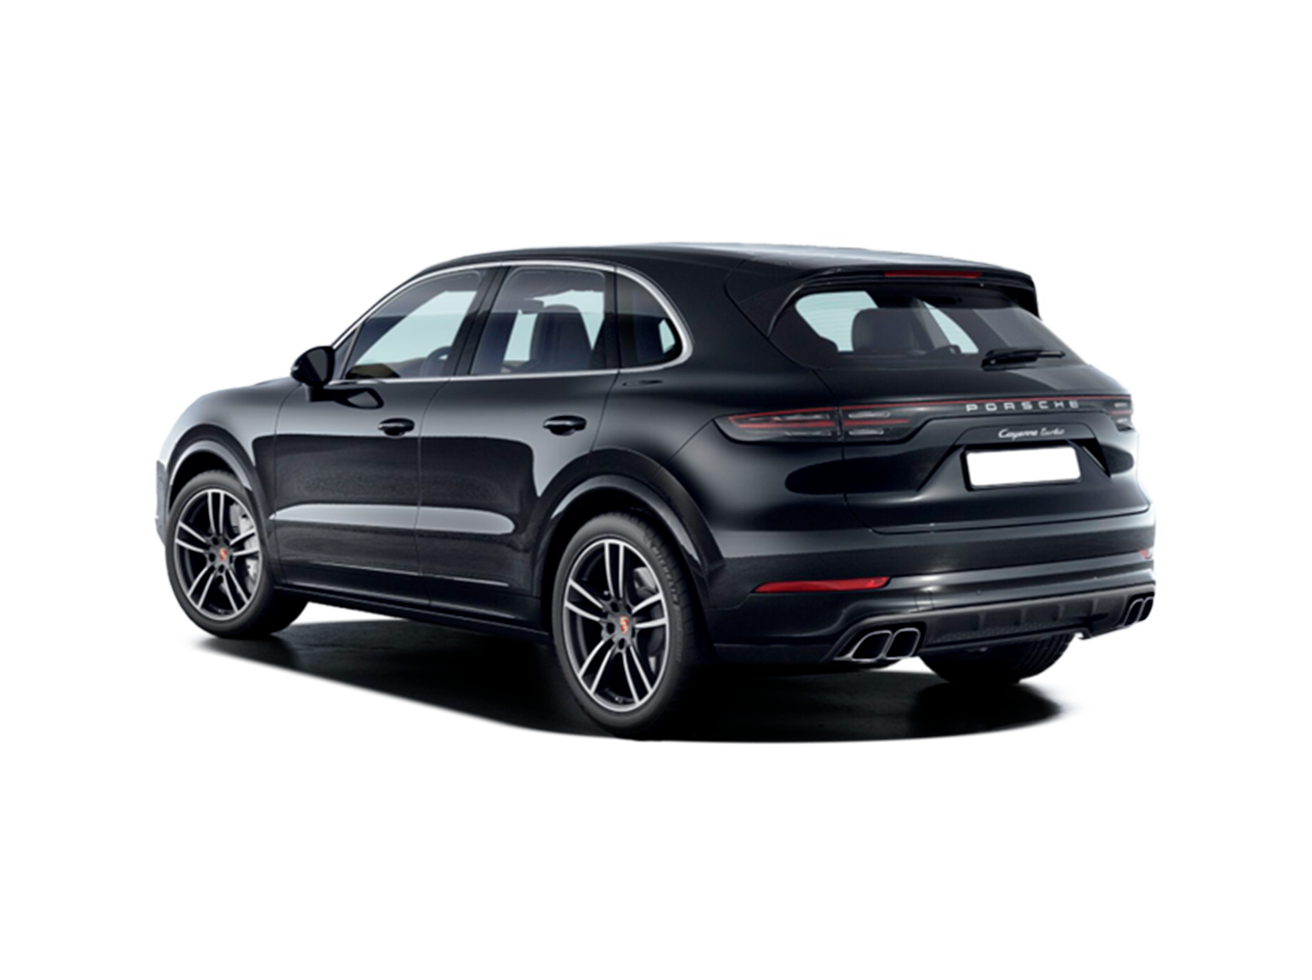 4.0 V8 GASOLINA TURBO AWD TIPTRONIC S